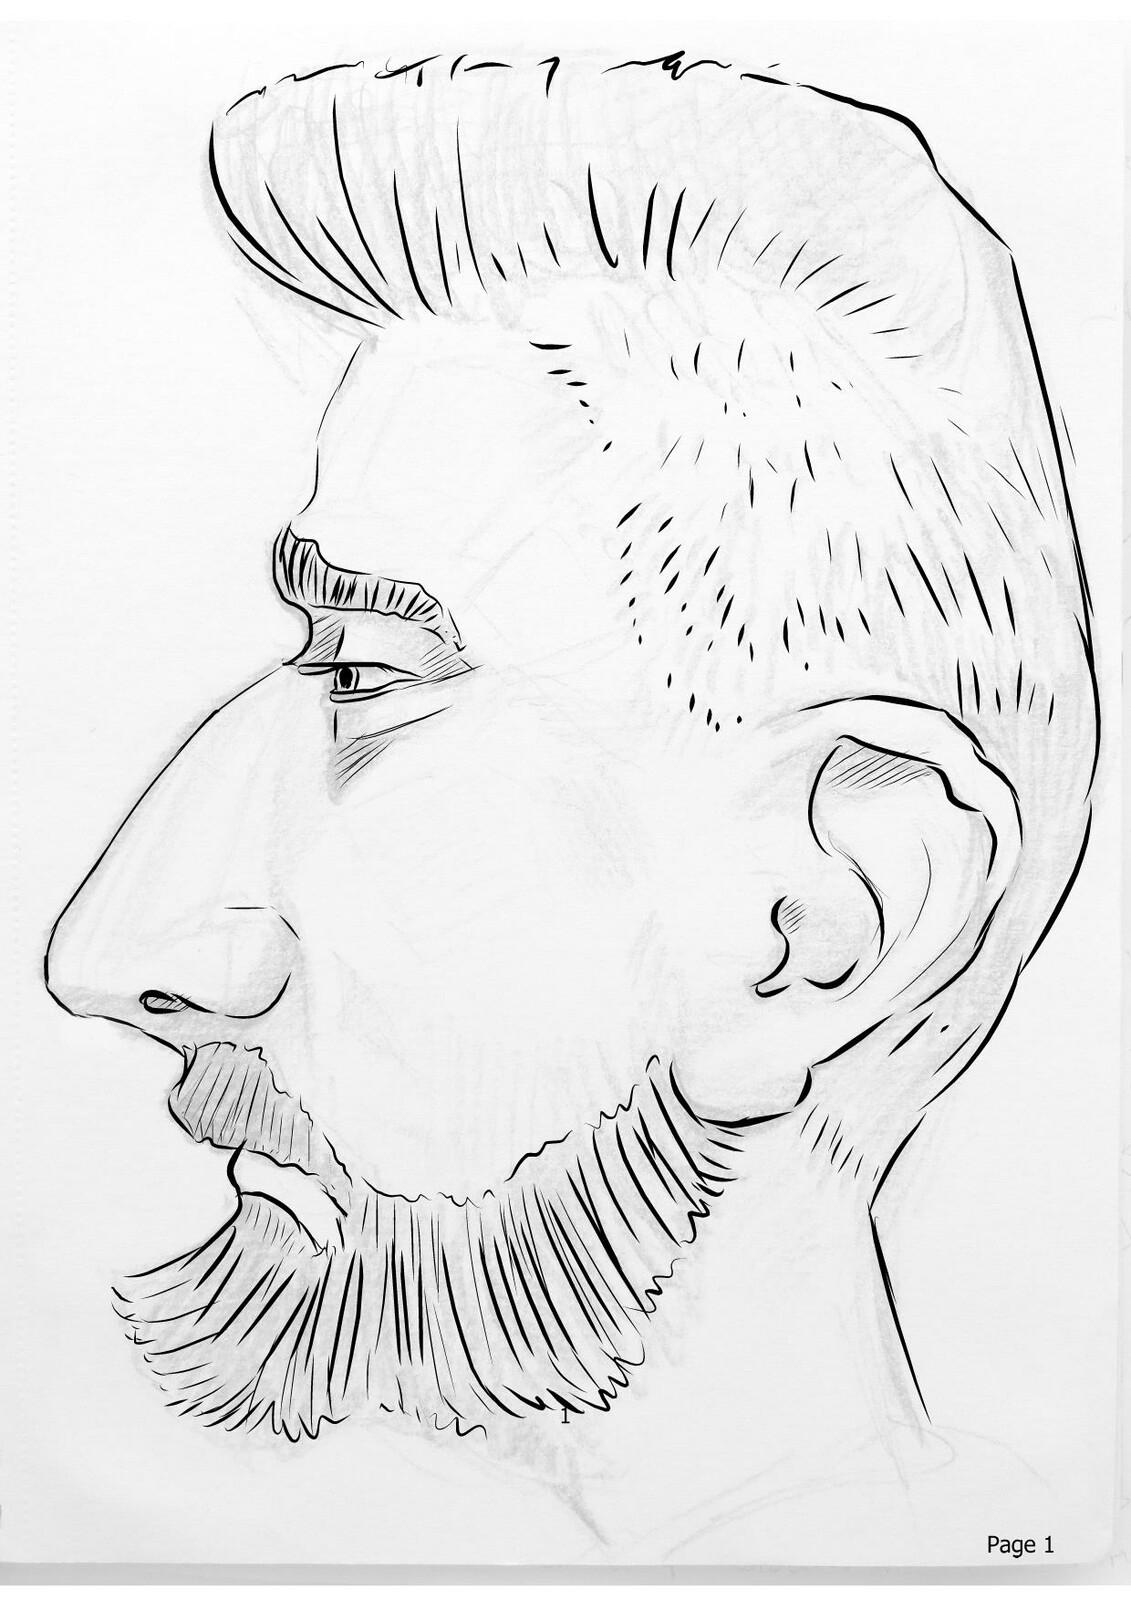 WIP - Caricature, golden ratio circles